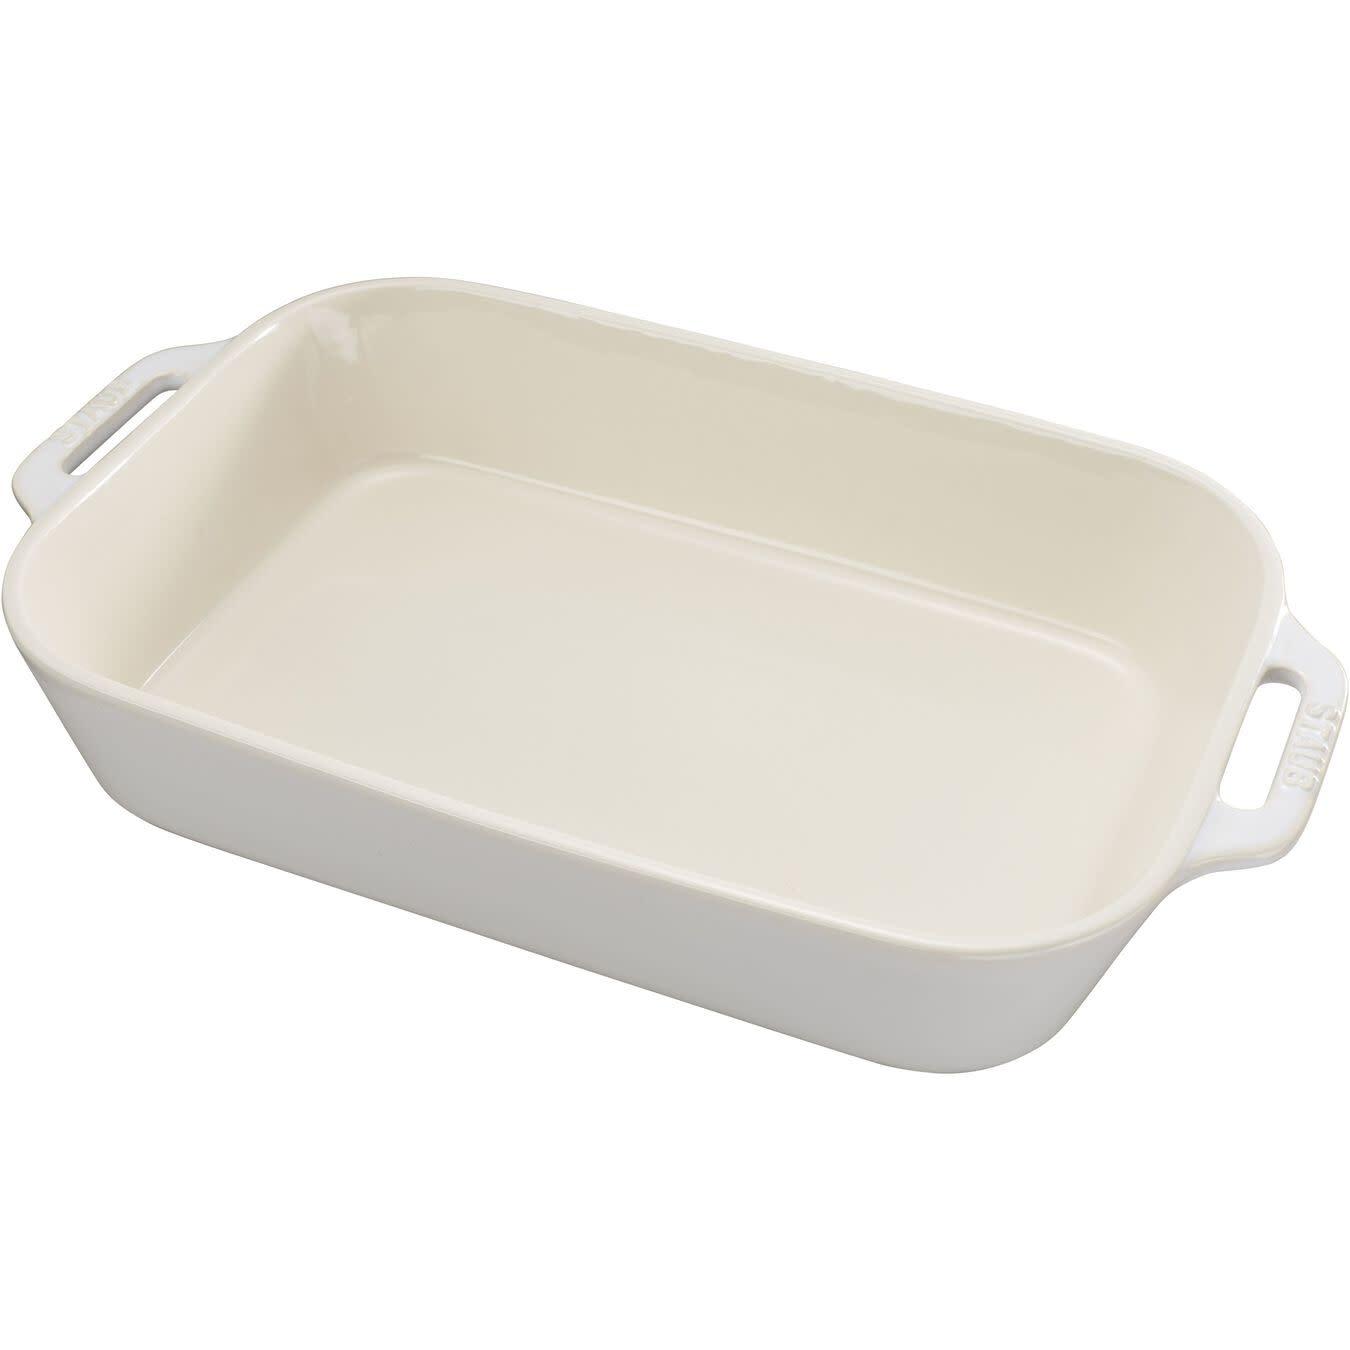 "Staub Rectangular Baking Dish Rustic White 34x24cm / 13""x9"""